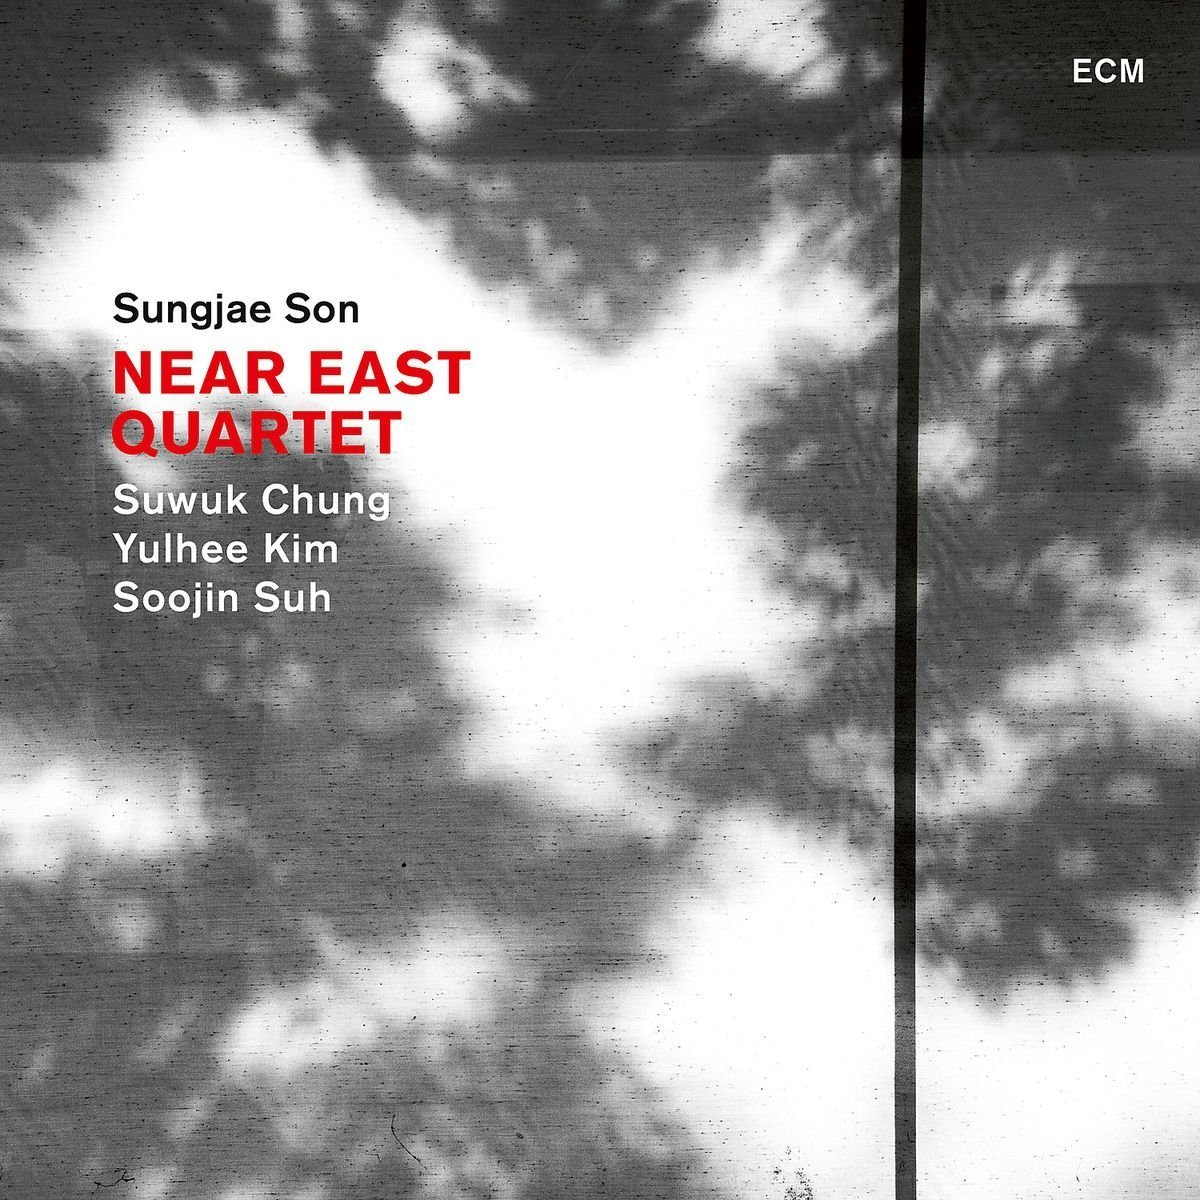 NEAR EAST QUARTET: Near East Quartet